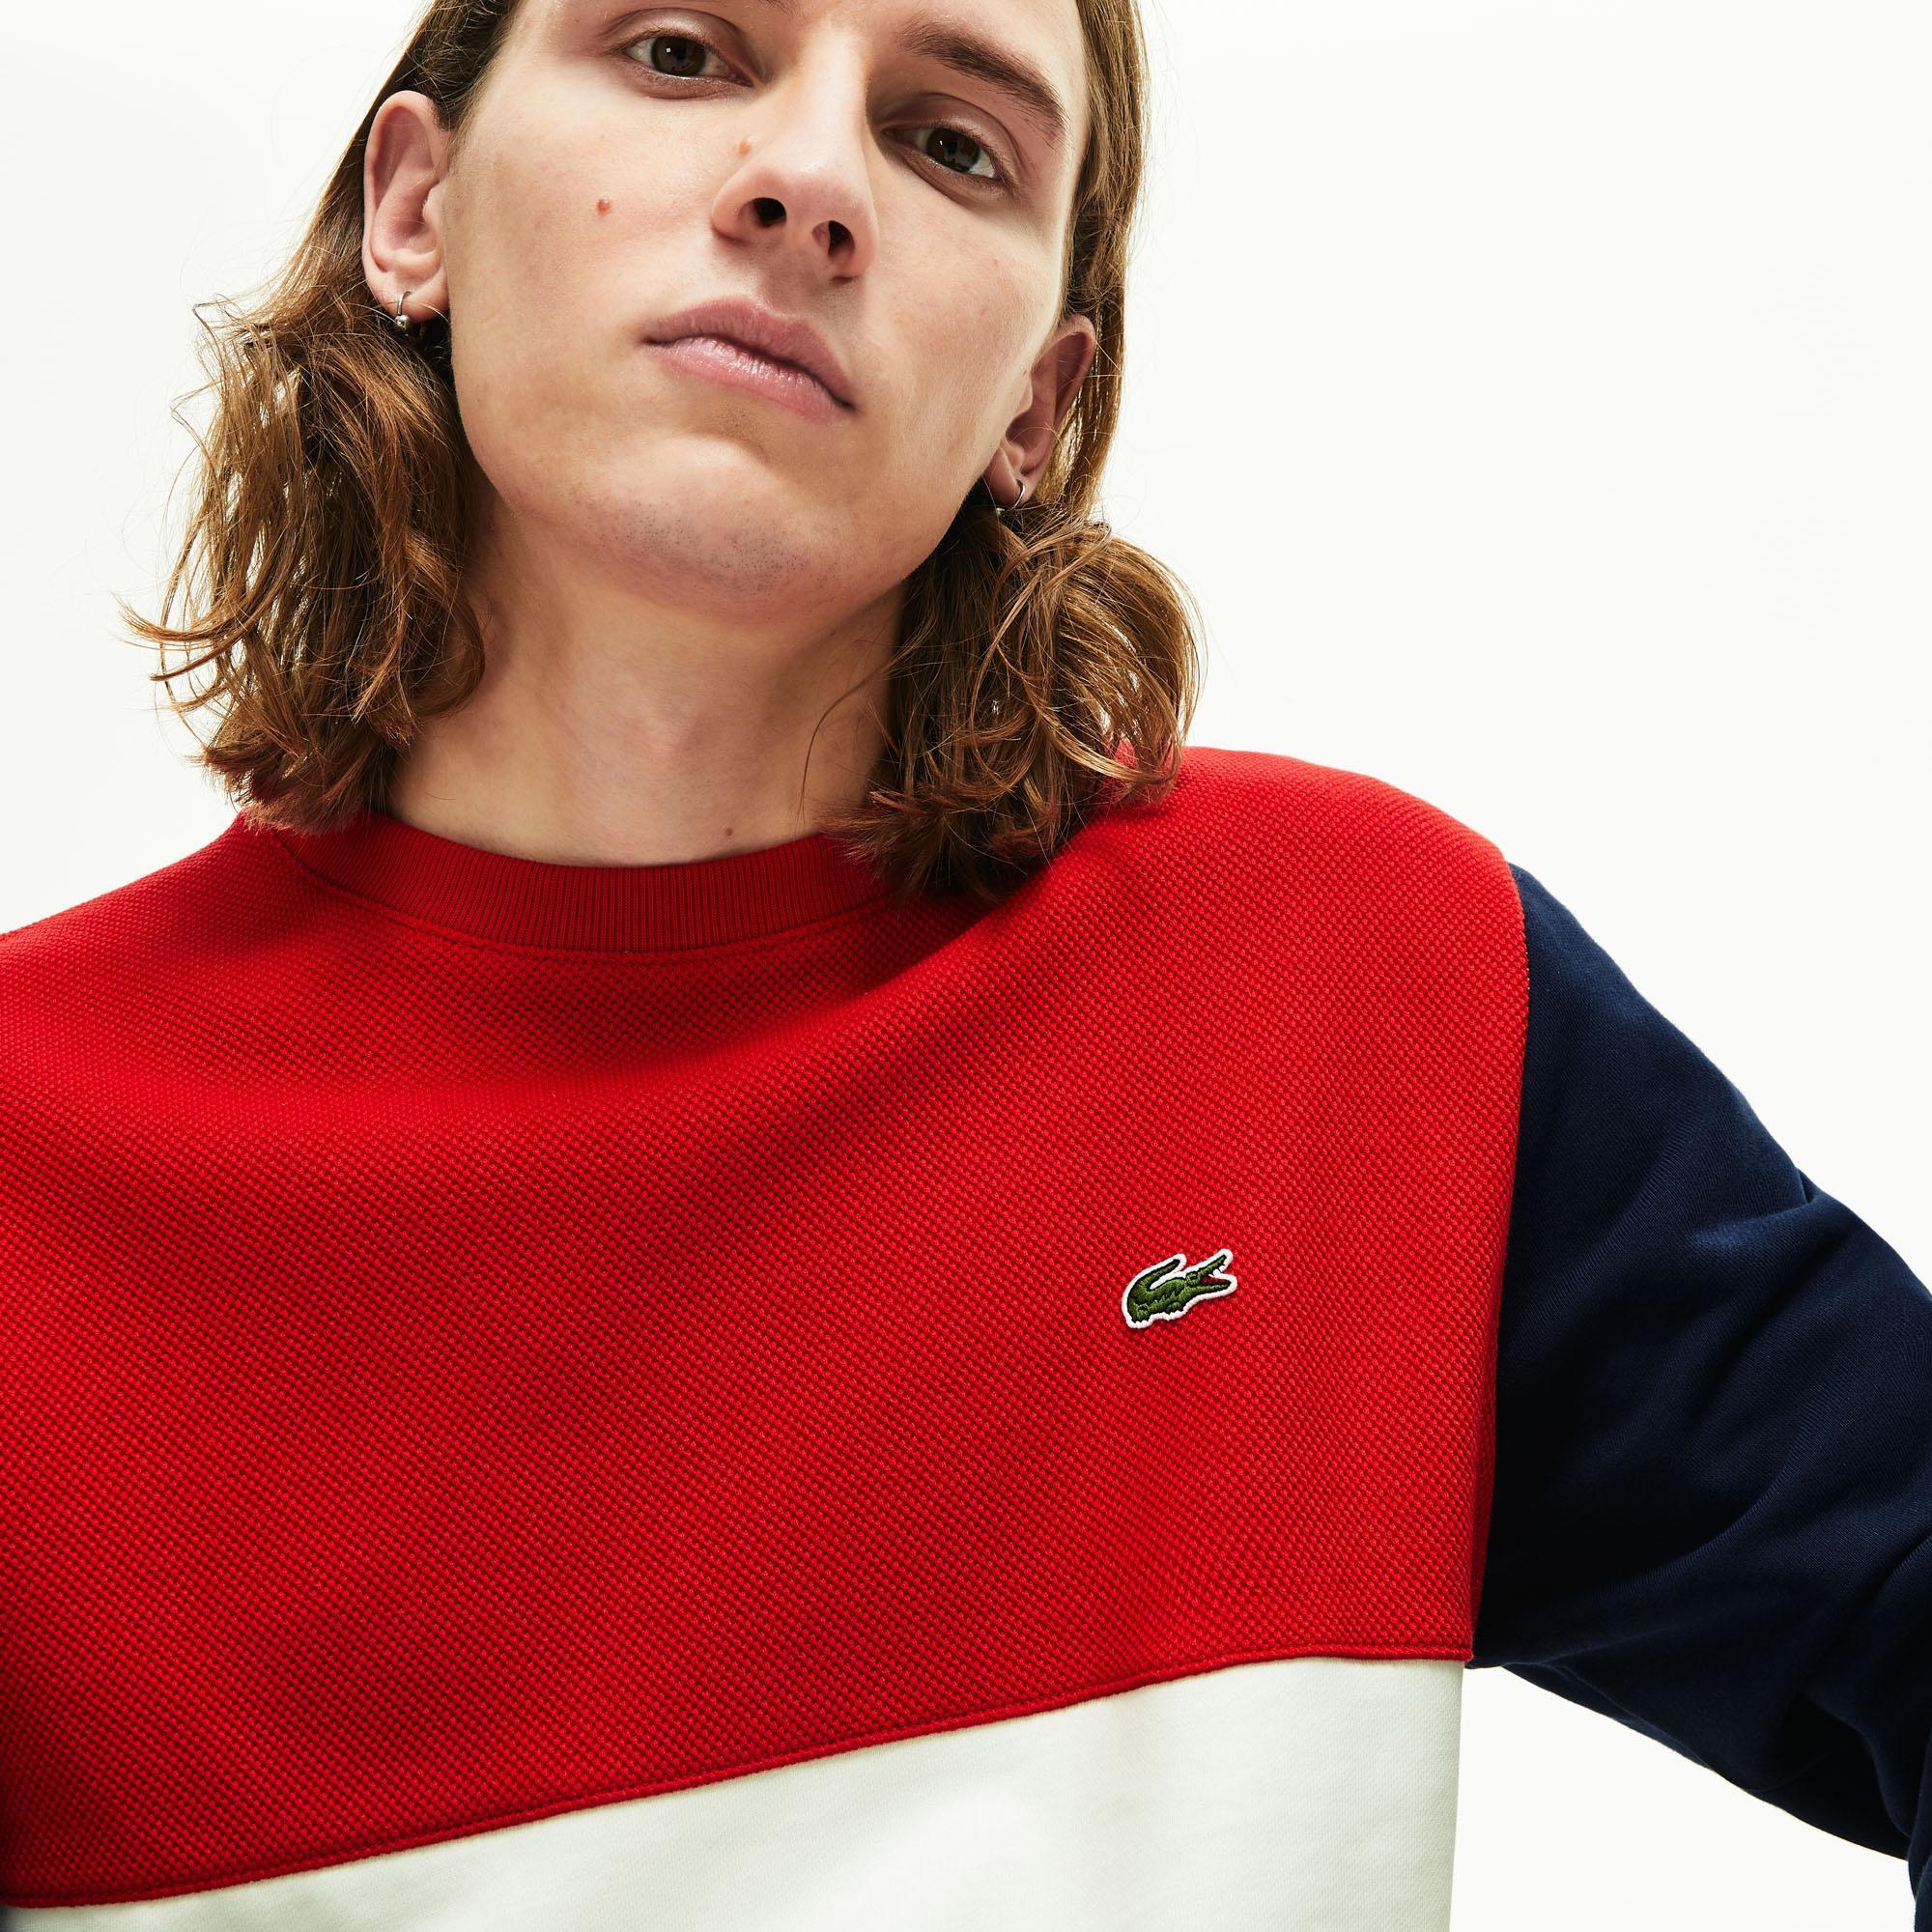 Lacoste Men's Colourblock Crew Neck Sweatshirt